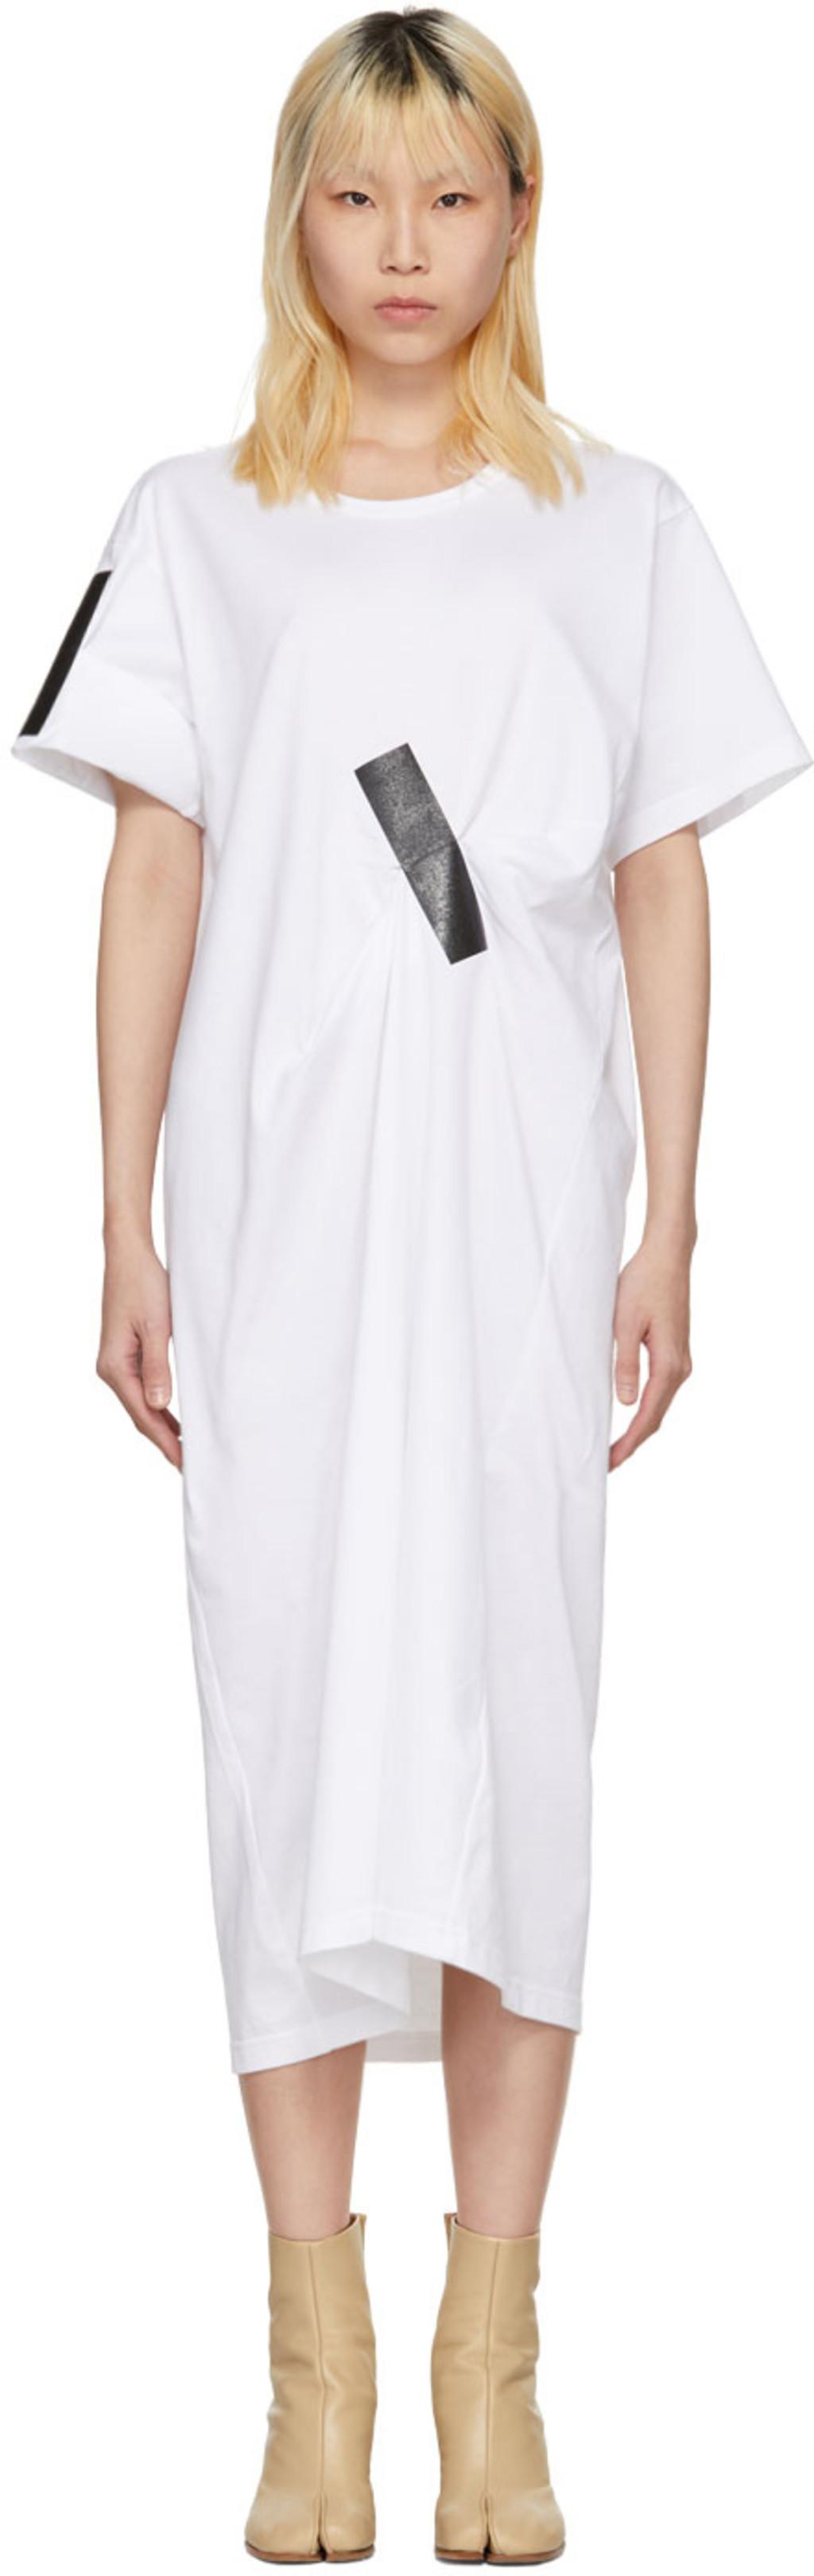 Formal Shirt Dresses